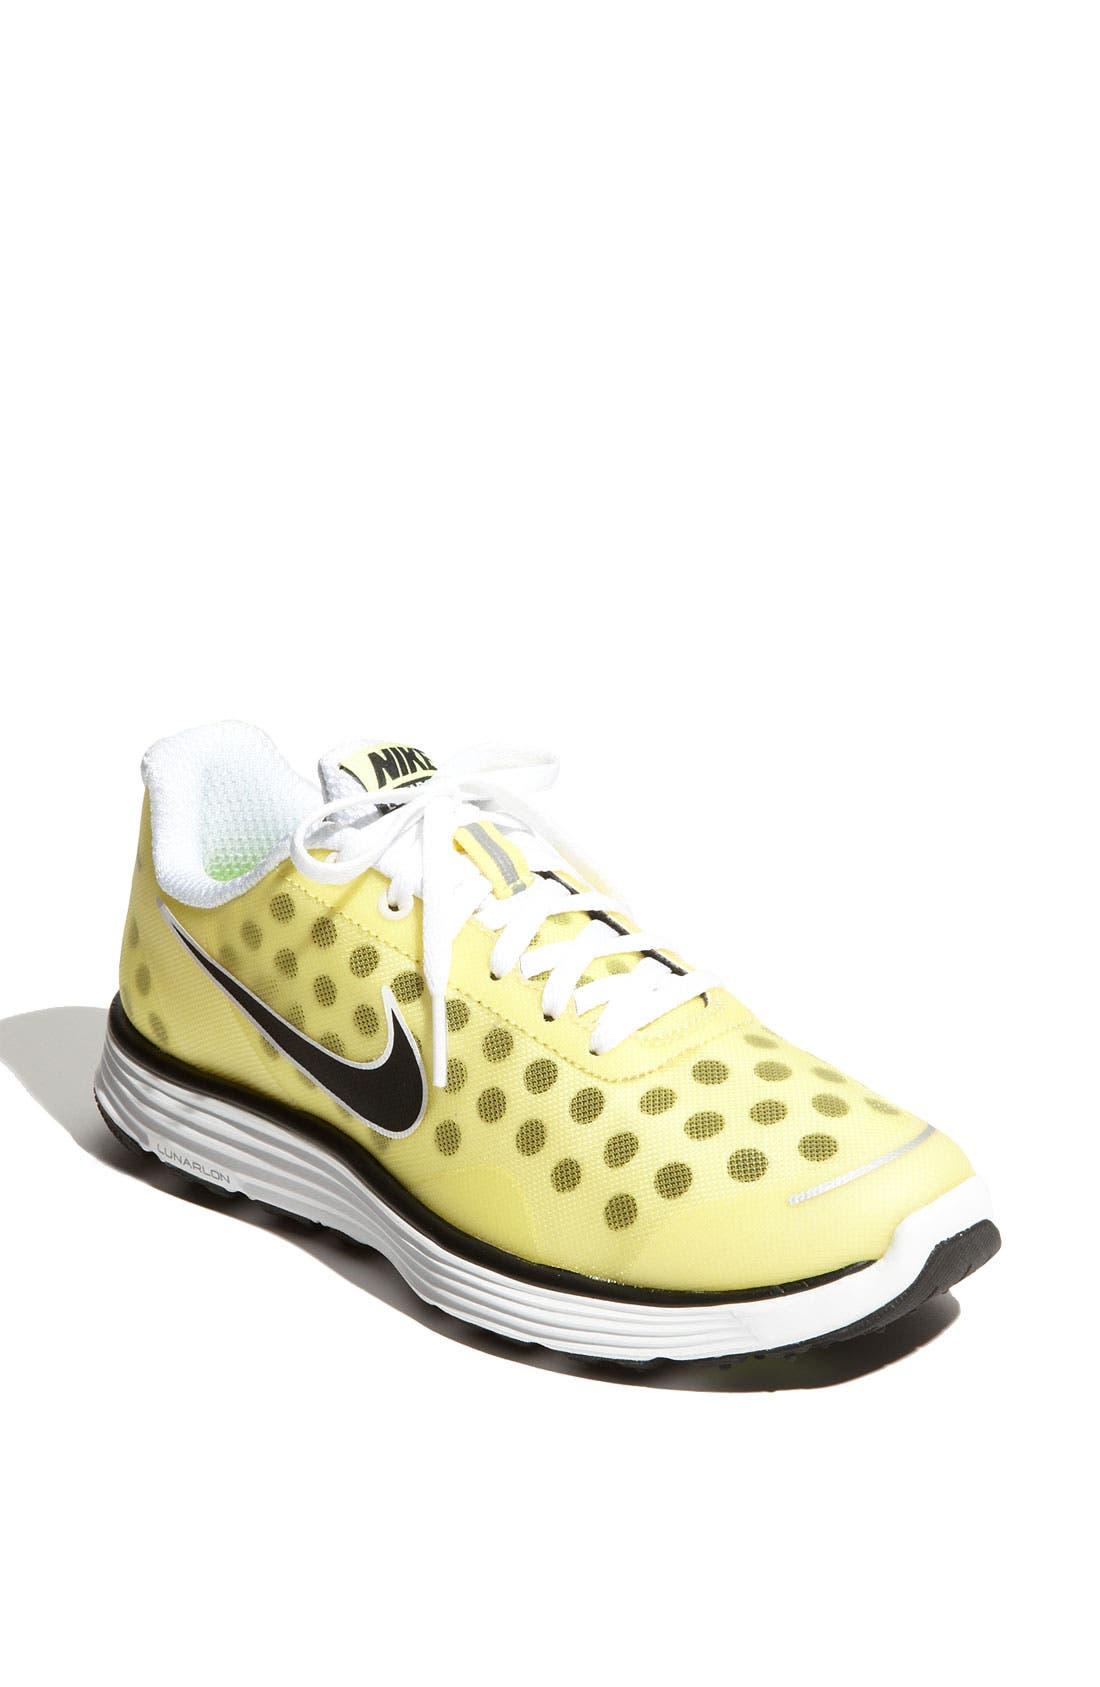 Alternate Image 1 Selected - Nike 'Lunarswift+ 2' Running Shoe (Women)